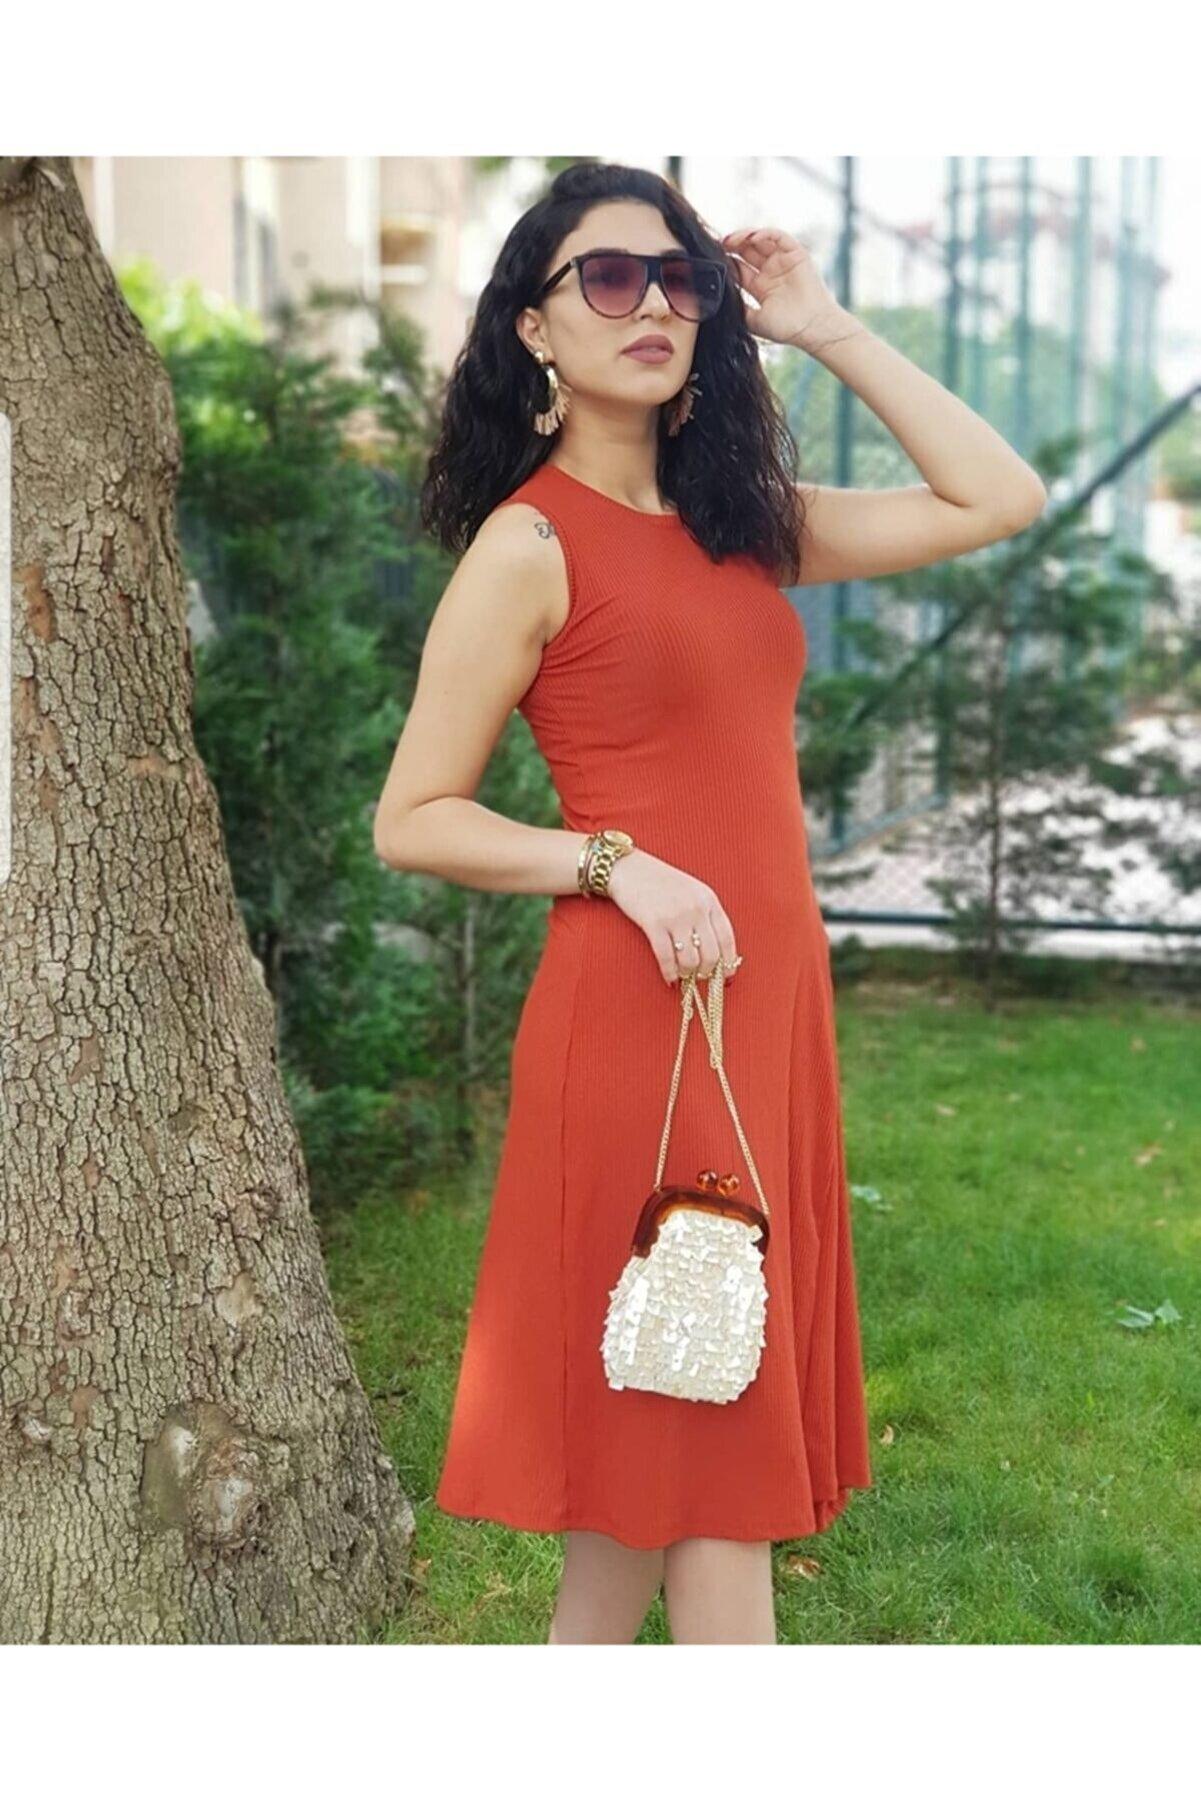 pacco butik Kadın Kiremit Asimetrik Kesim Kolsuz Elbise